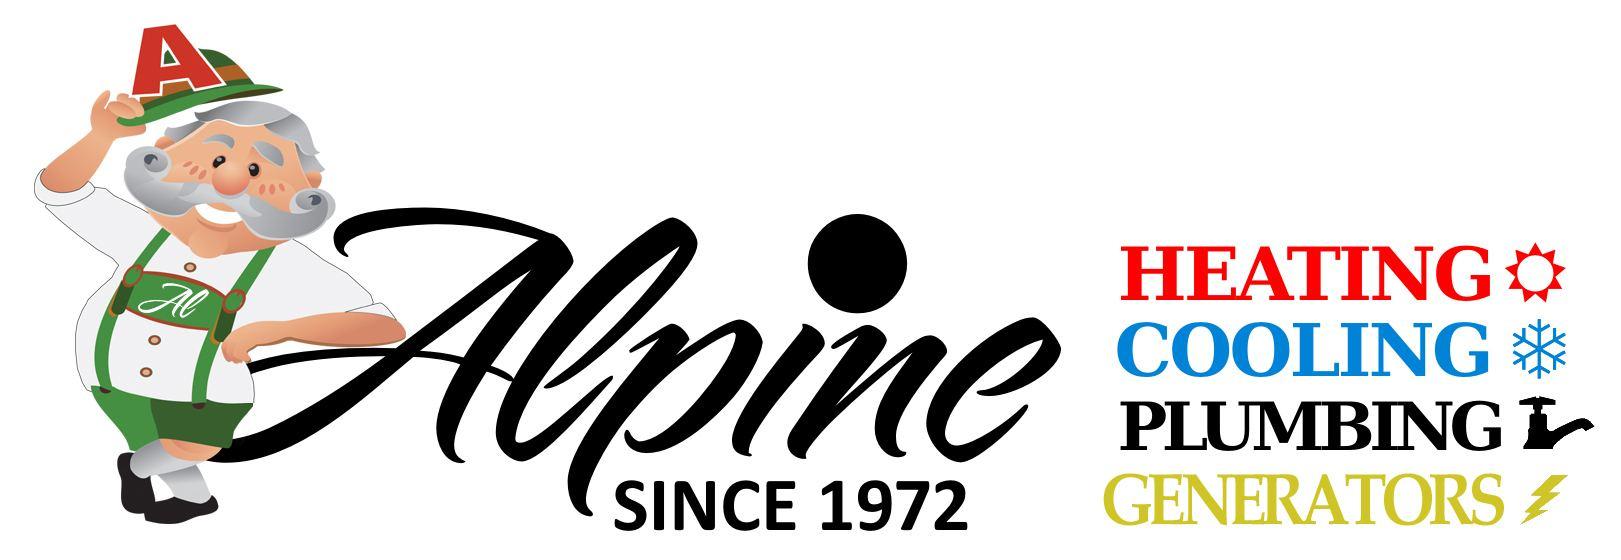 New Alpine Logo w generators